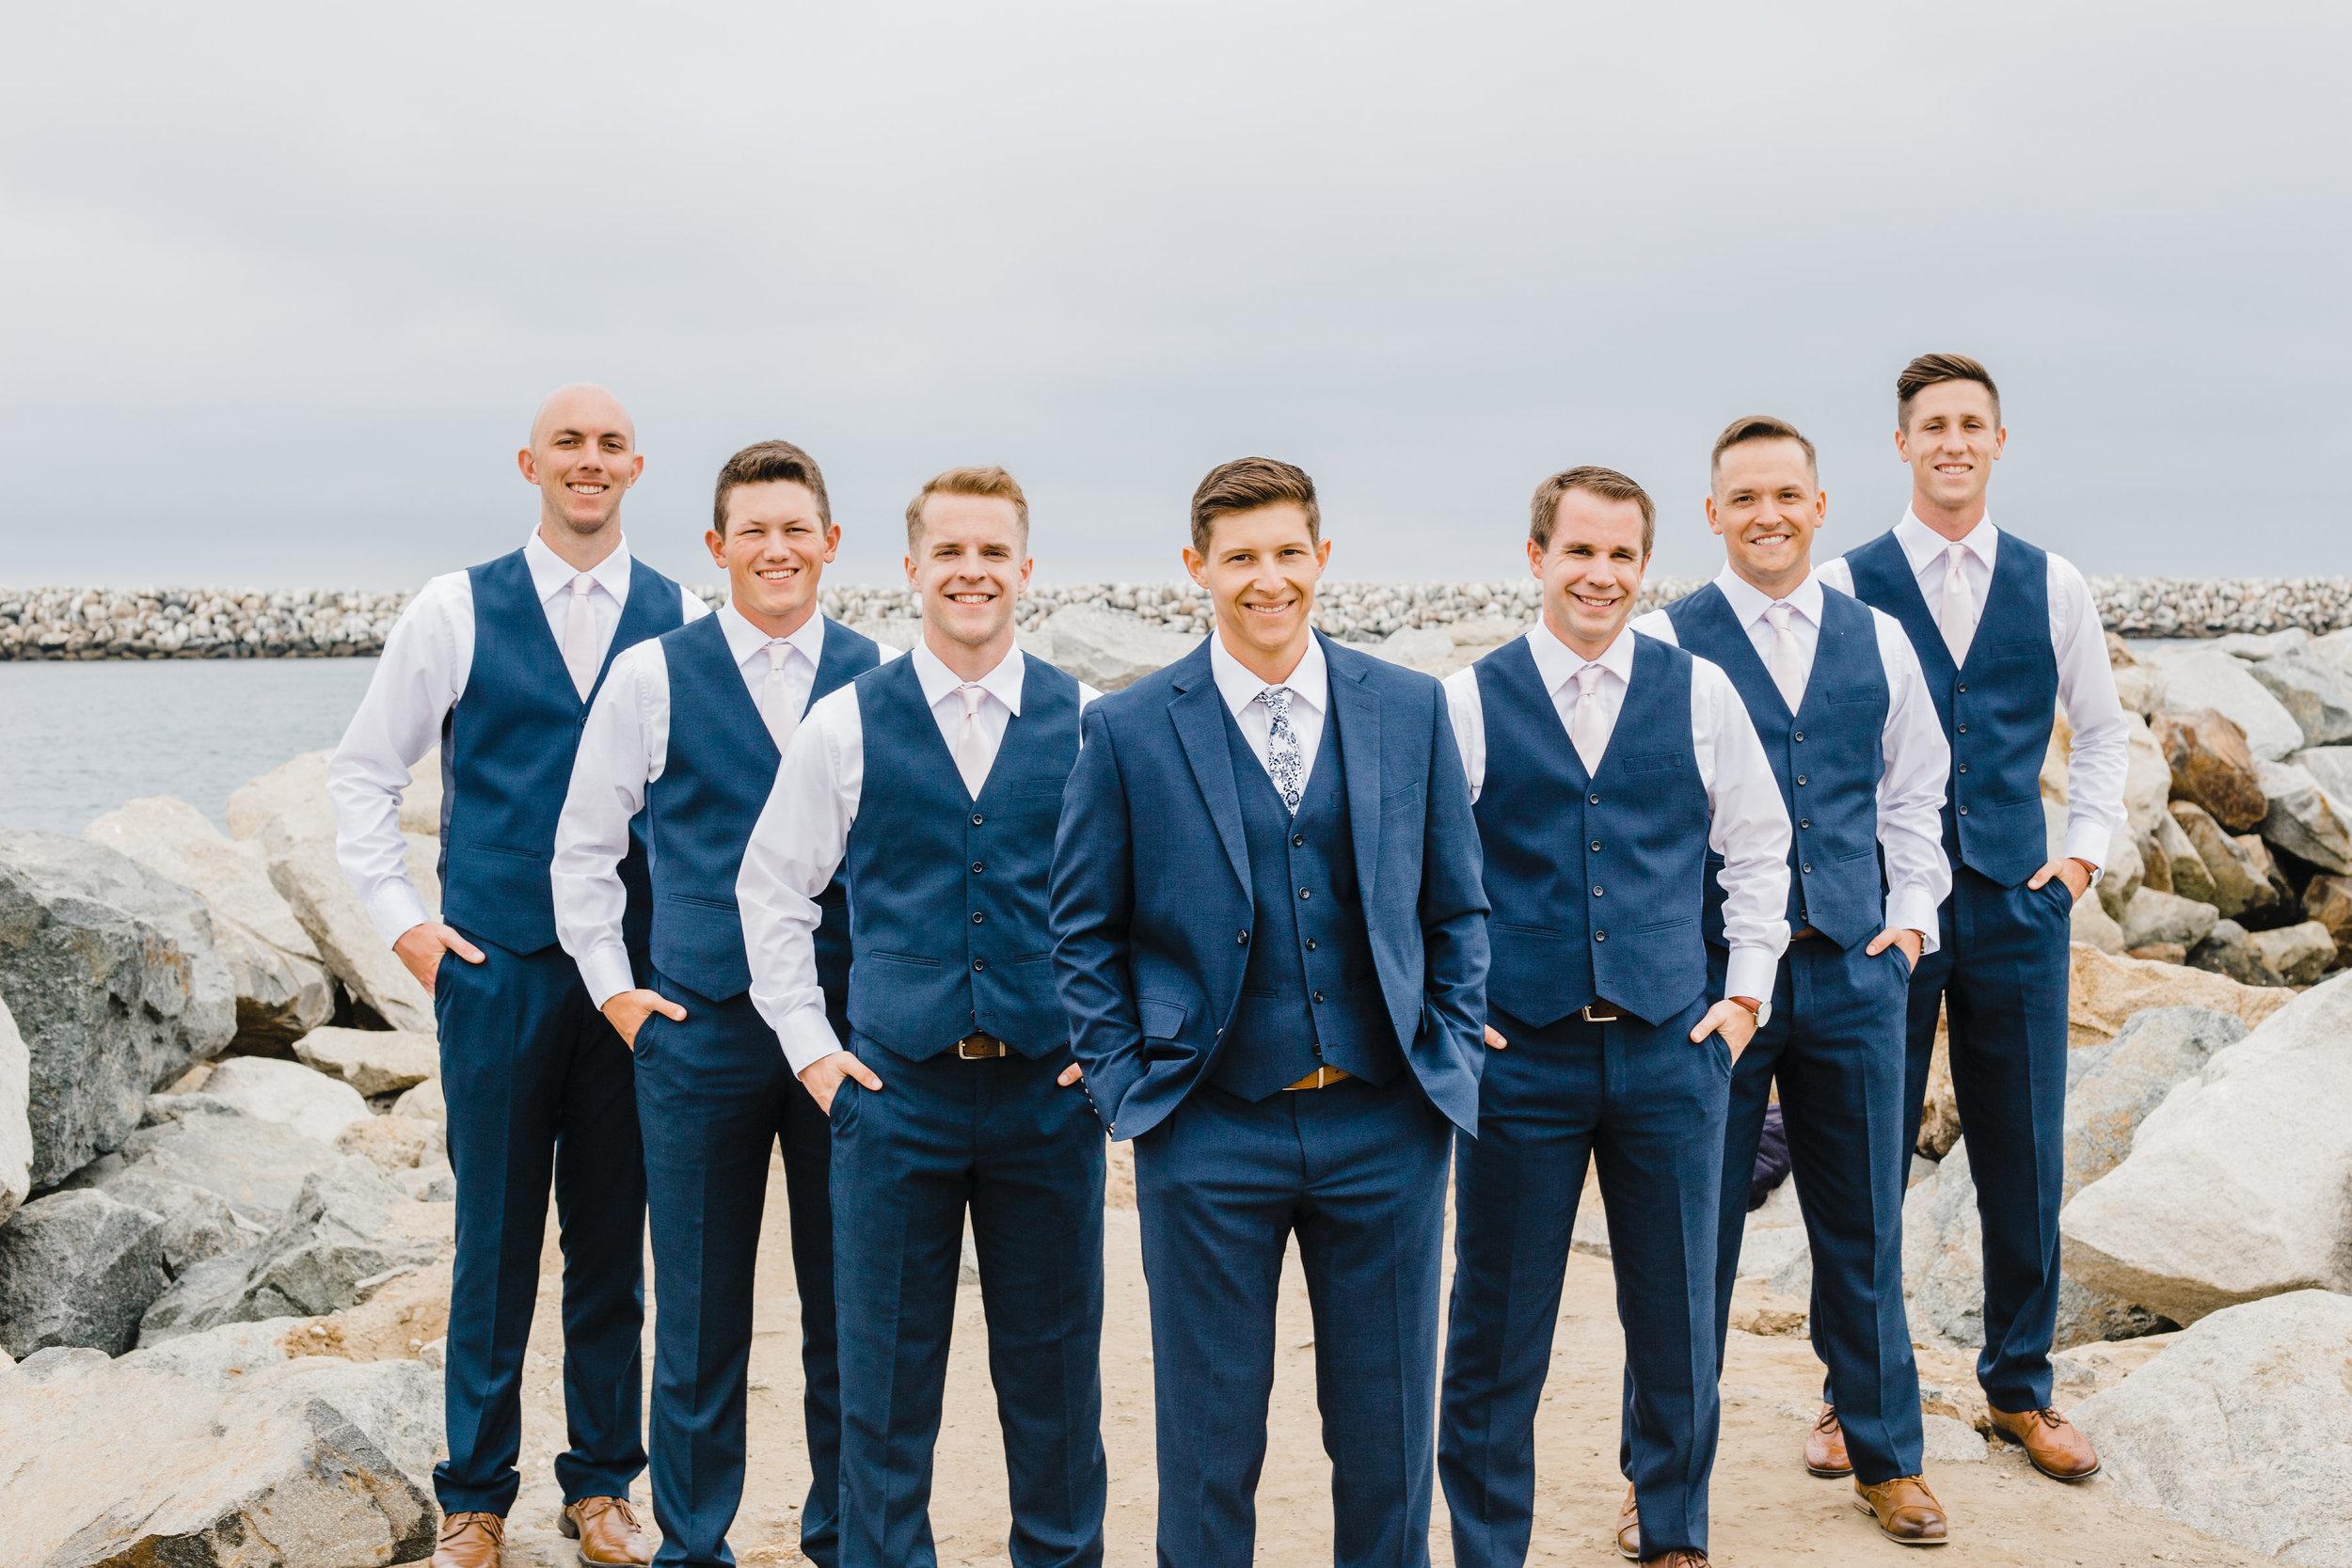 lakewood colorado professional wedding photographer beach wedding groomsmen wedding party navy suits